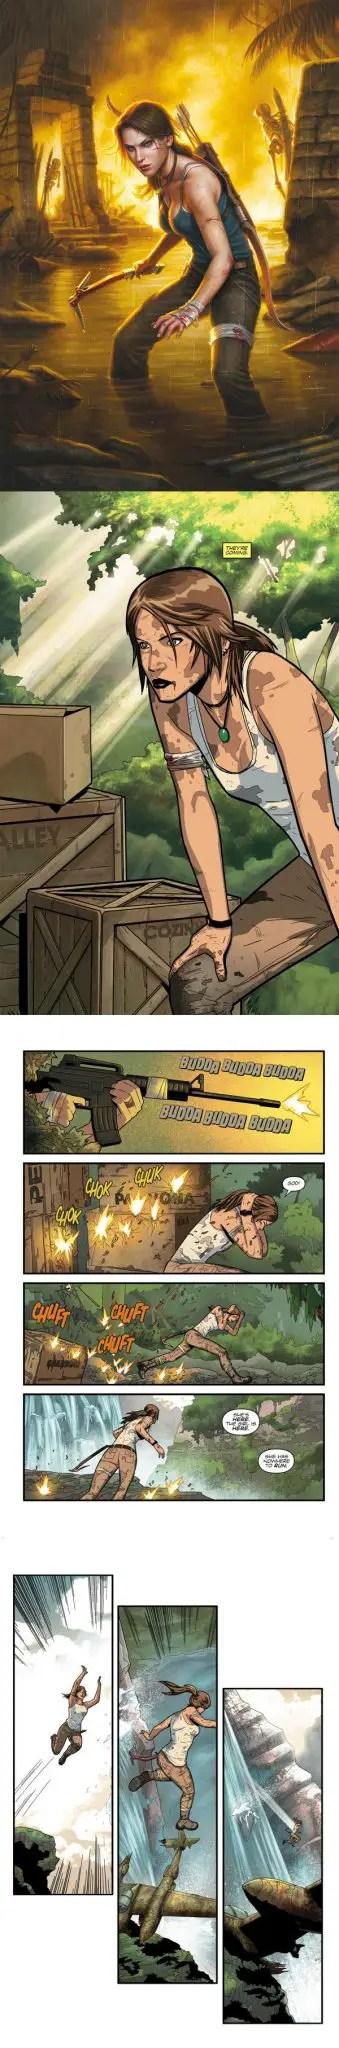 Preview: Dark Horse's Tomb Raider #1